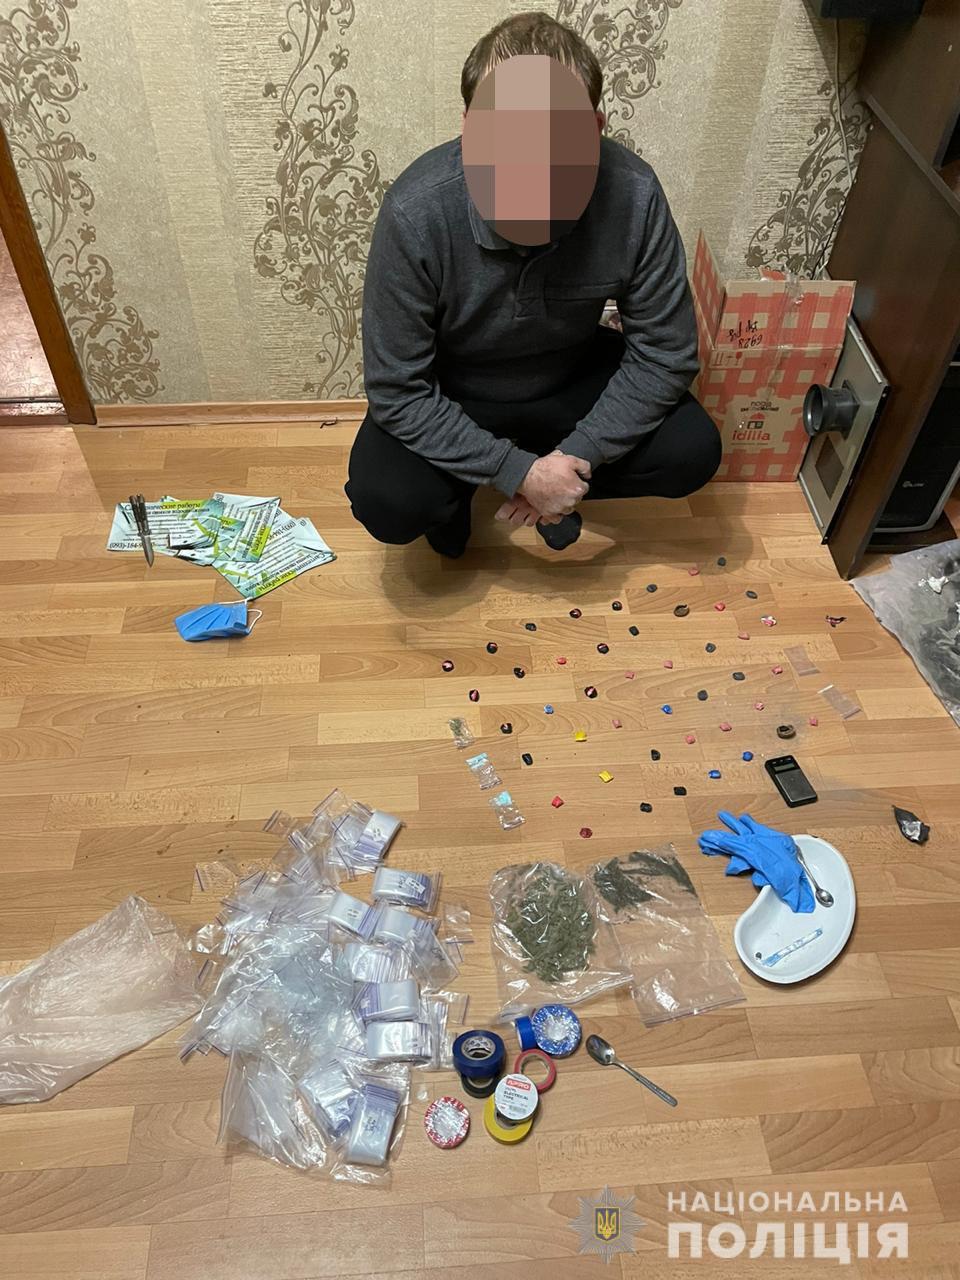 Наркозакладчика задержали в Харькове (фото)